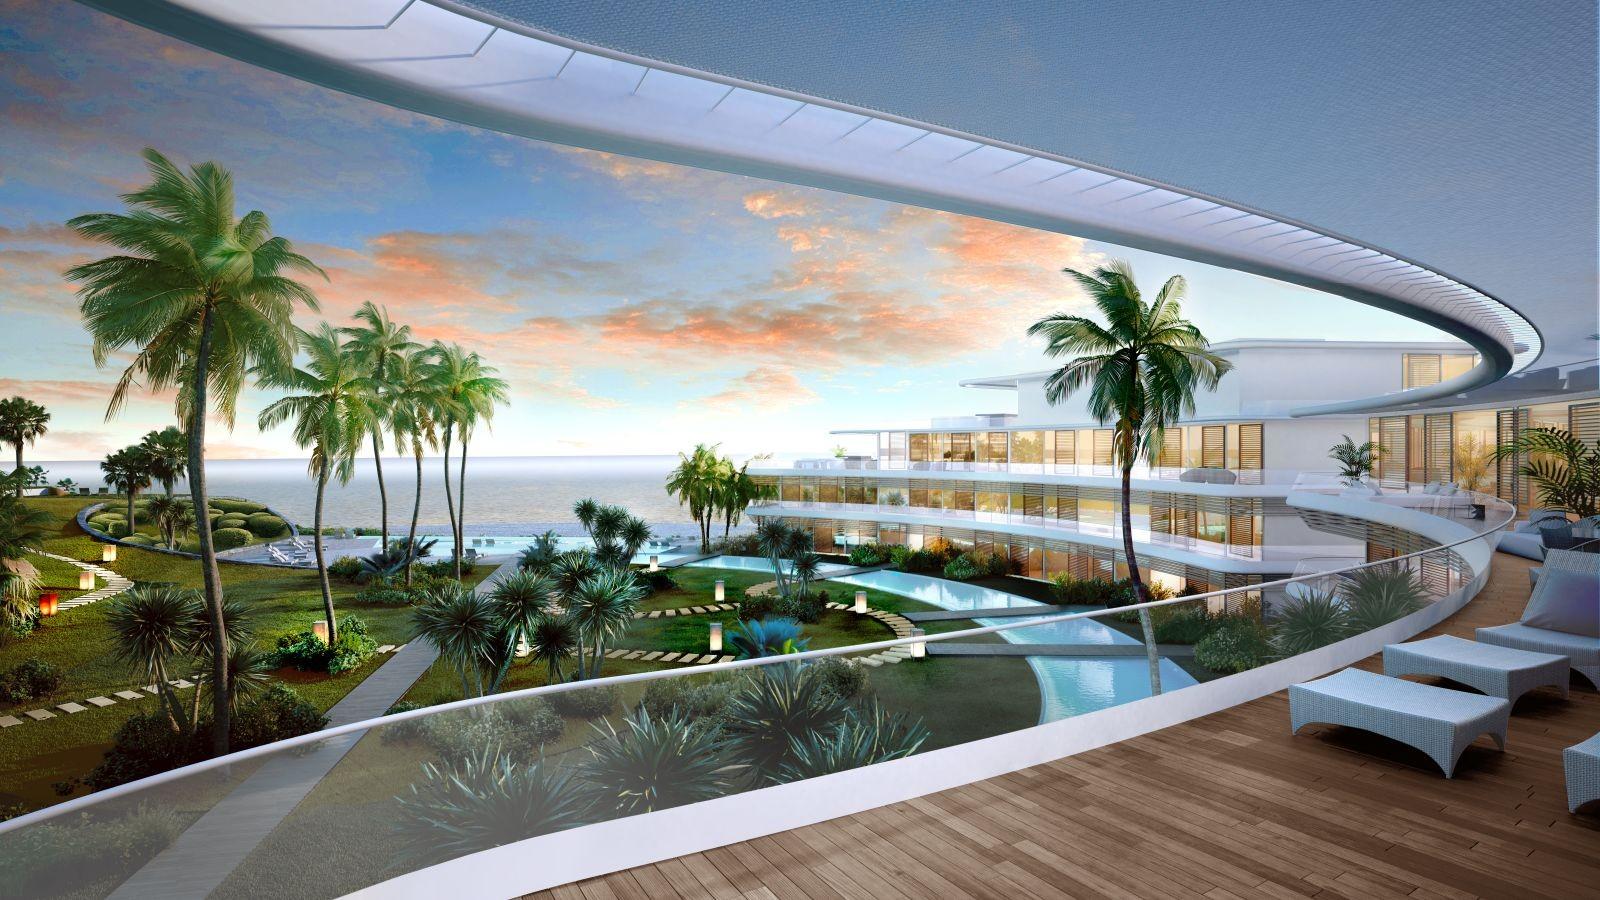 Fantastic new construction for sale in Estepona PL.34